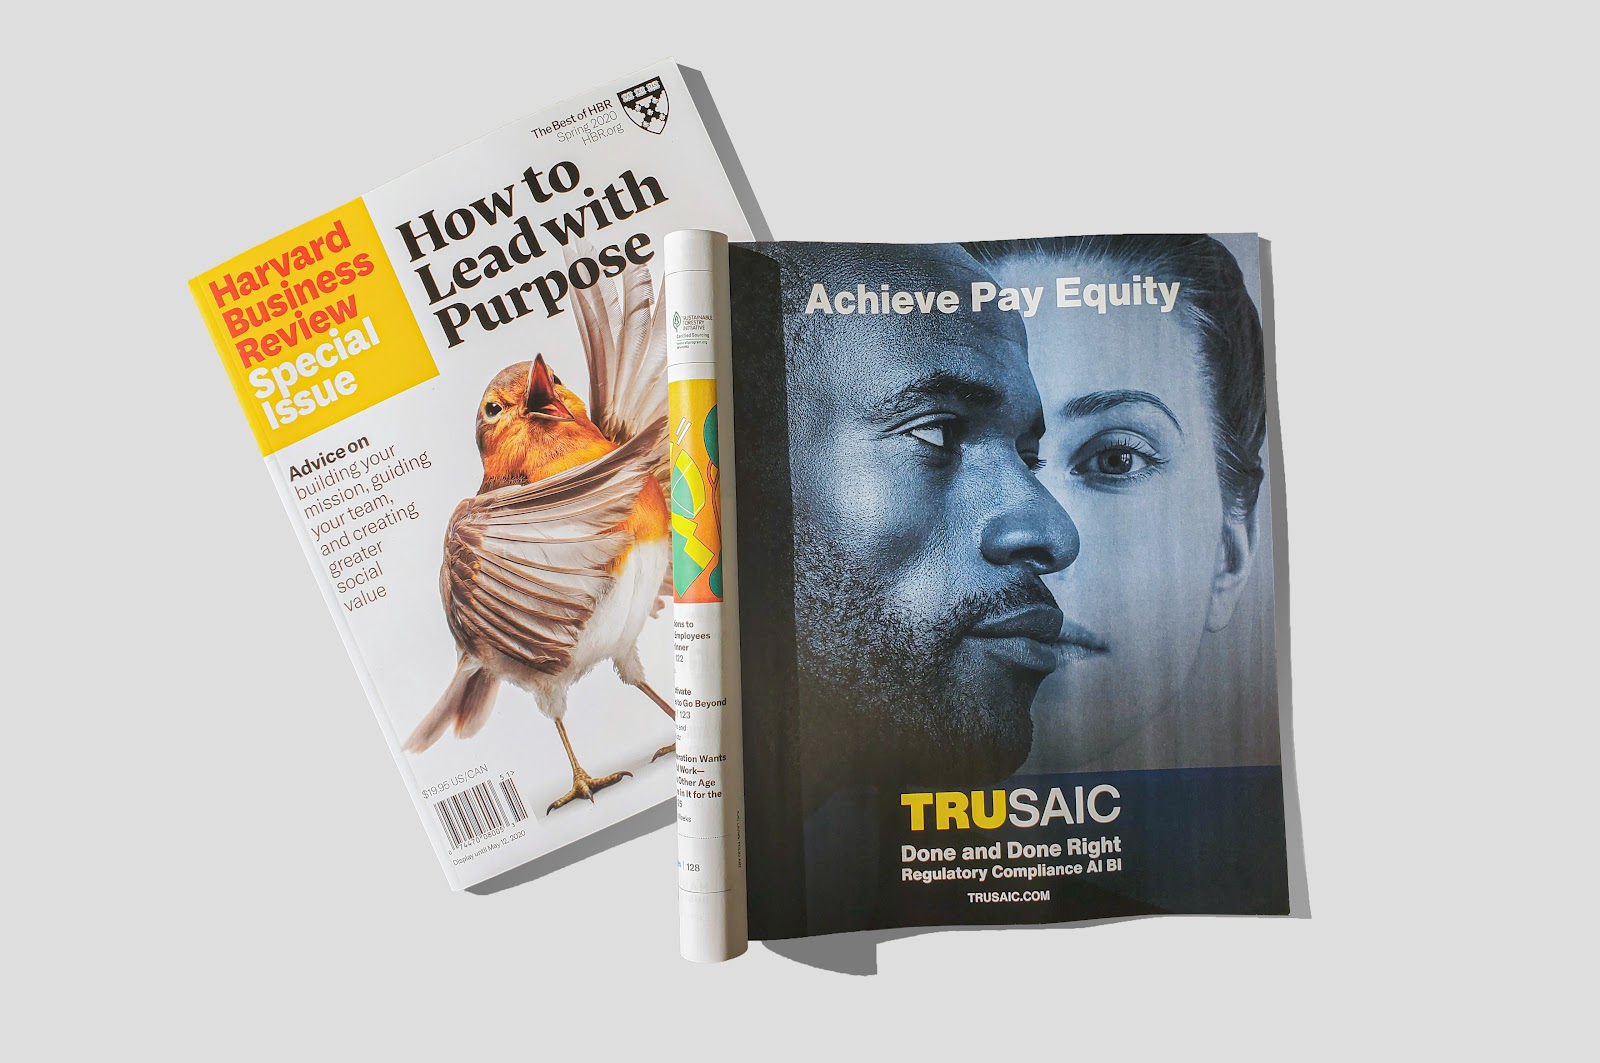 Magazine image of Trusaic